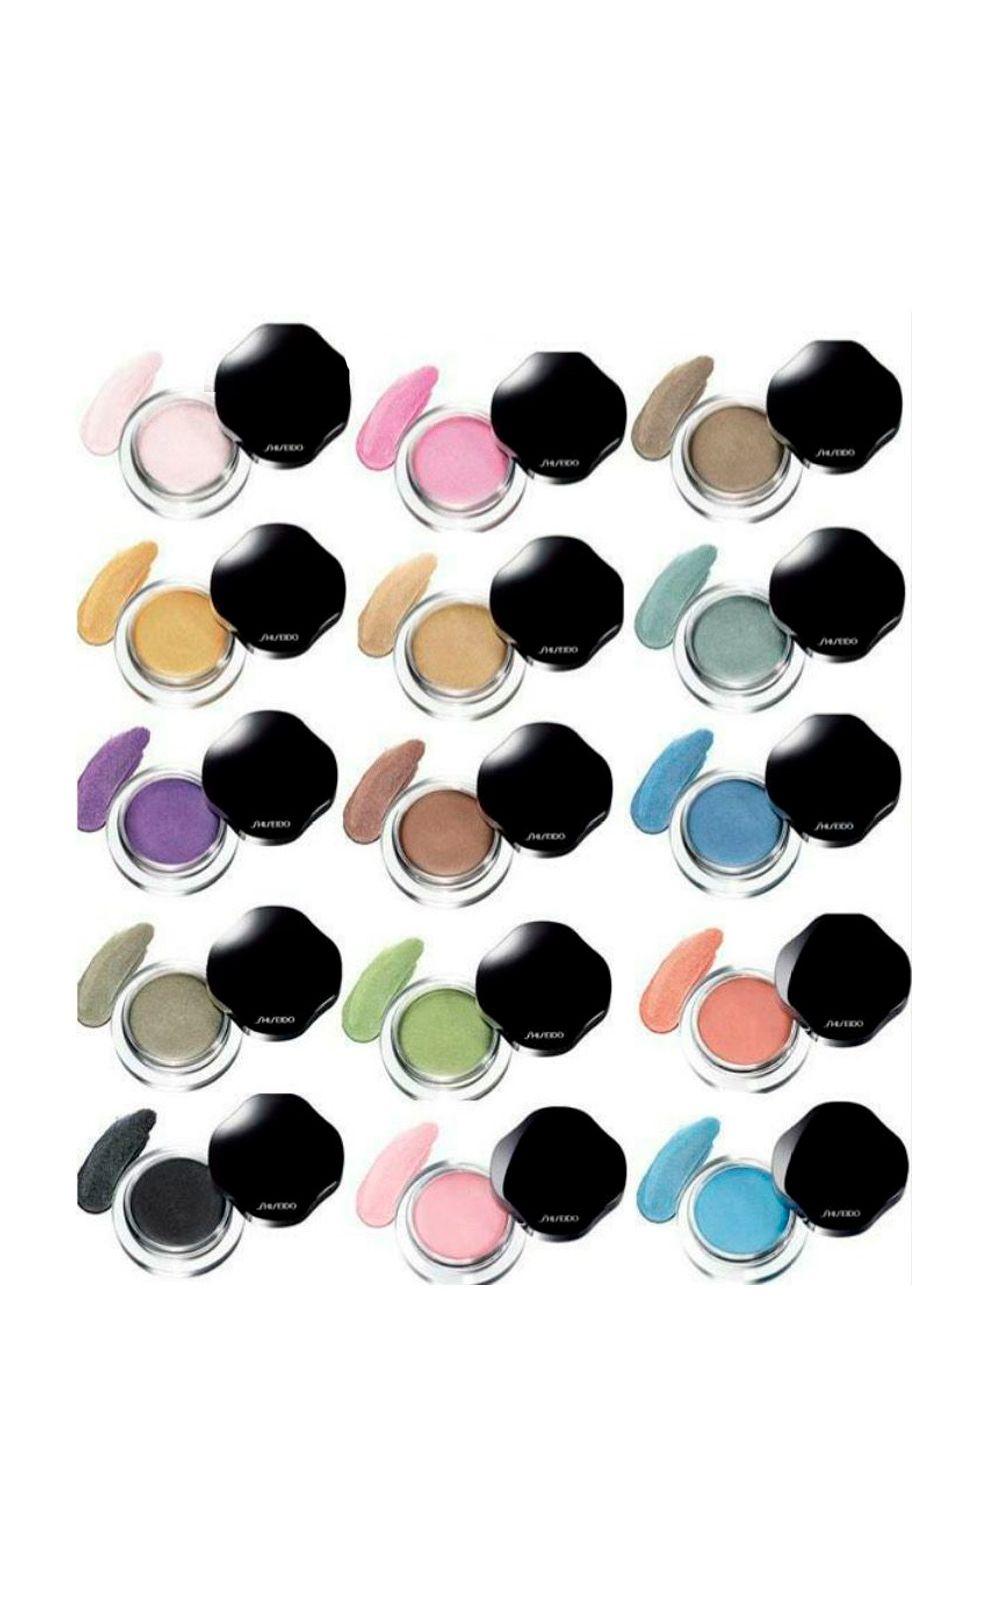 Foto 3 - Shimmering Cream Eye Color Shiseido - Sombra - VI226